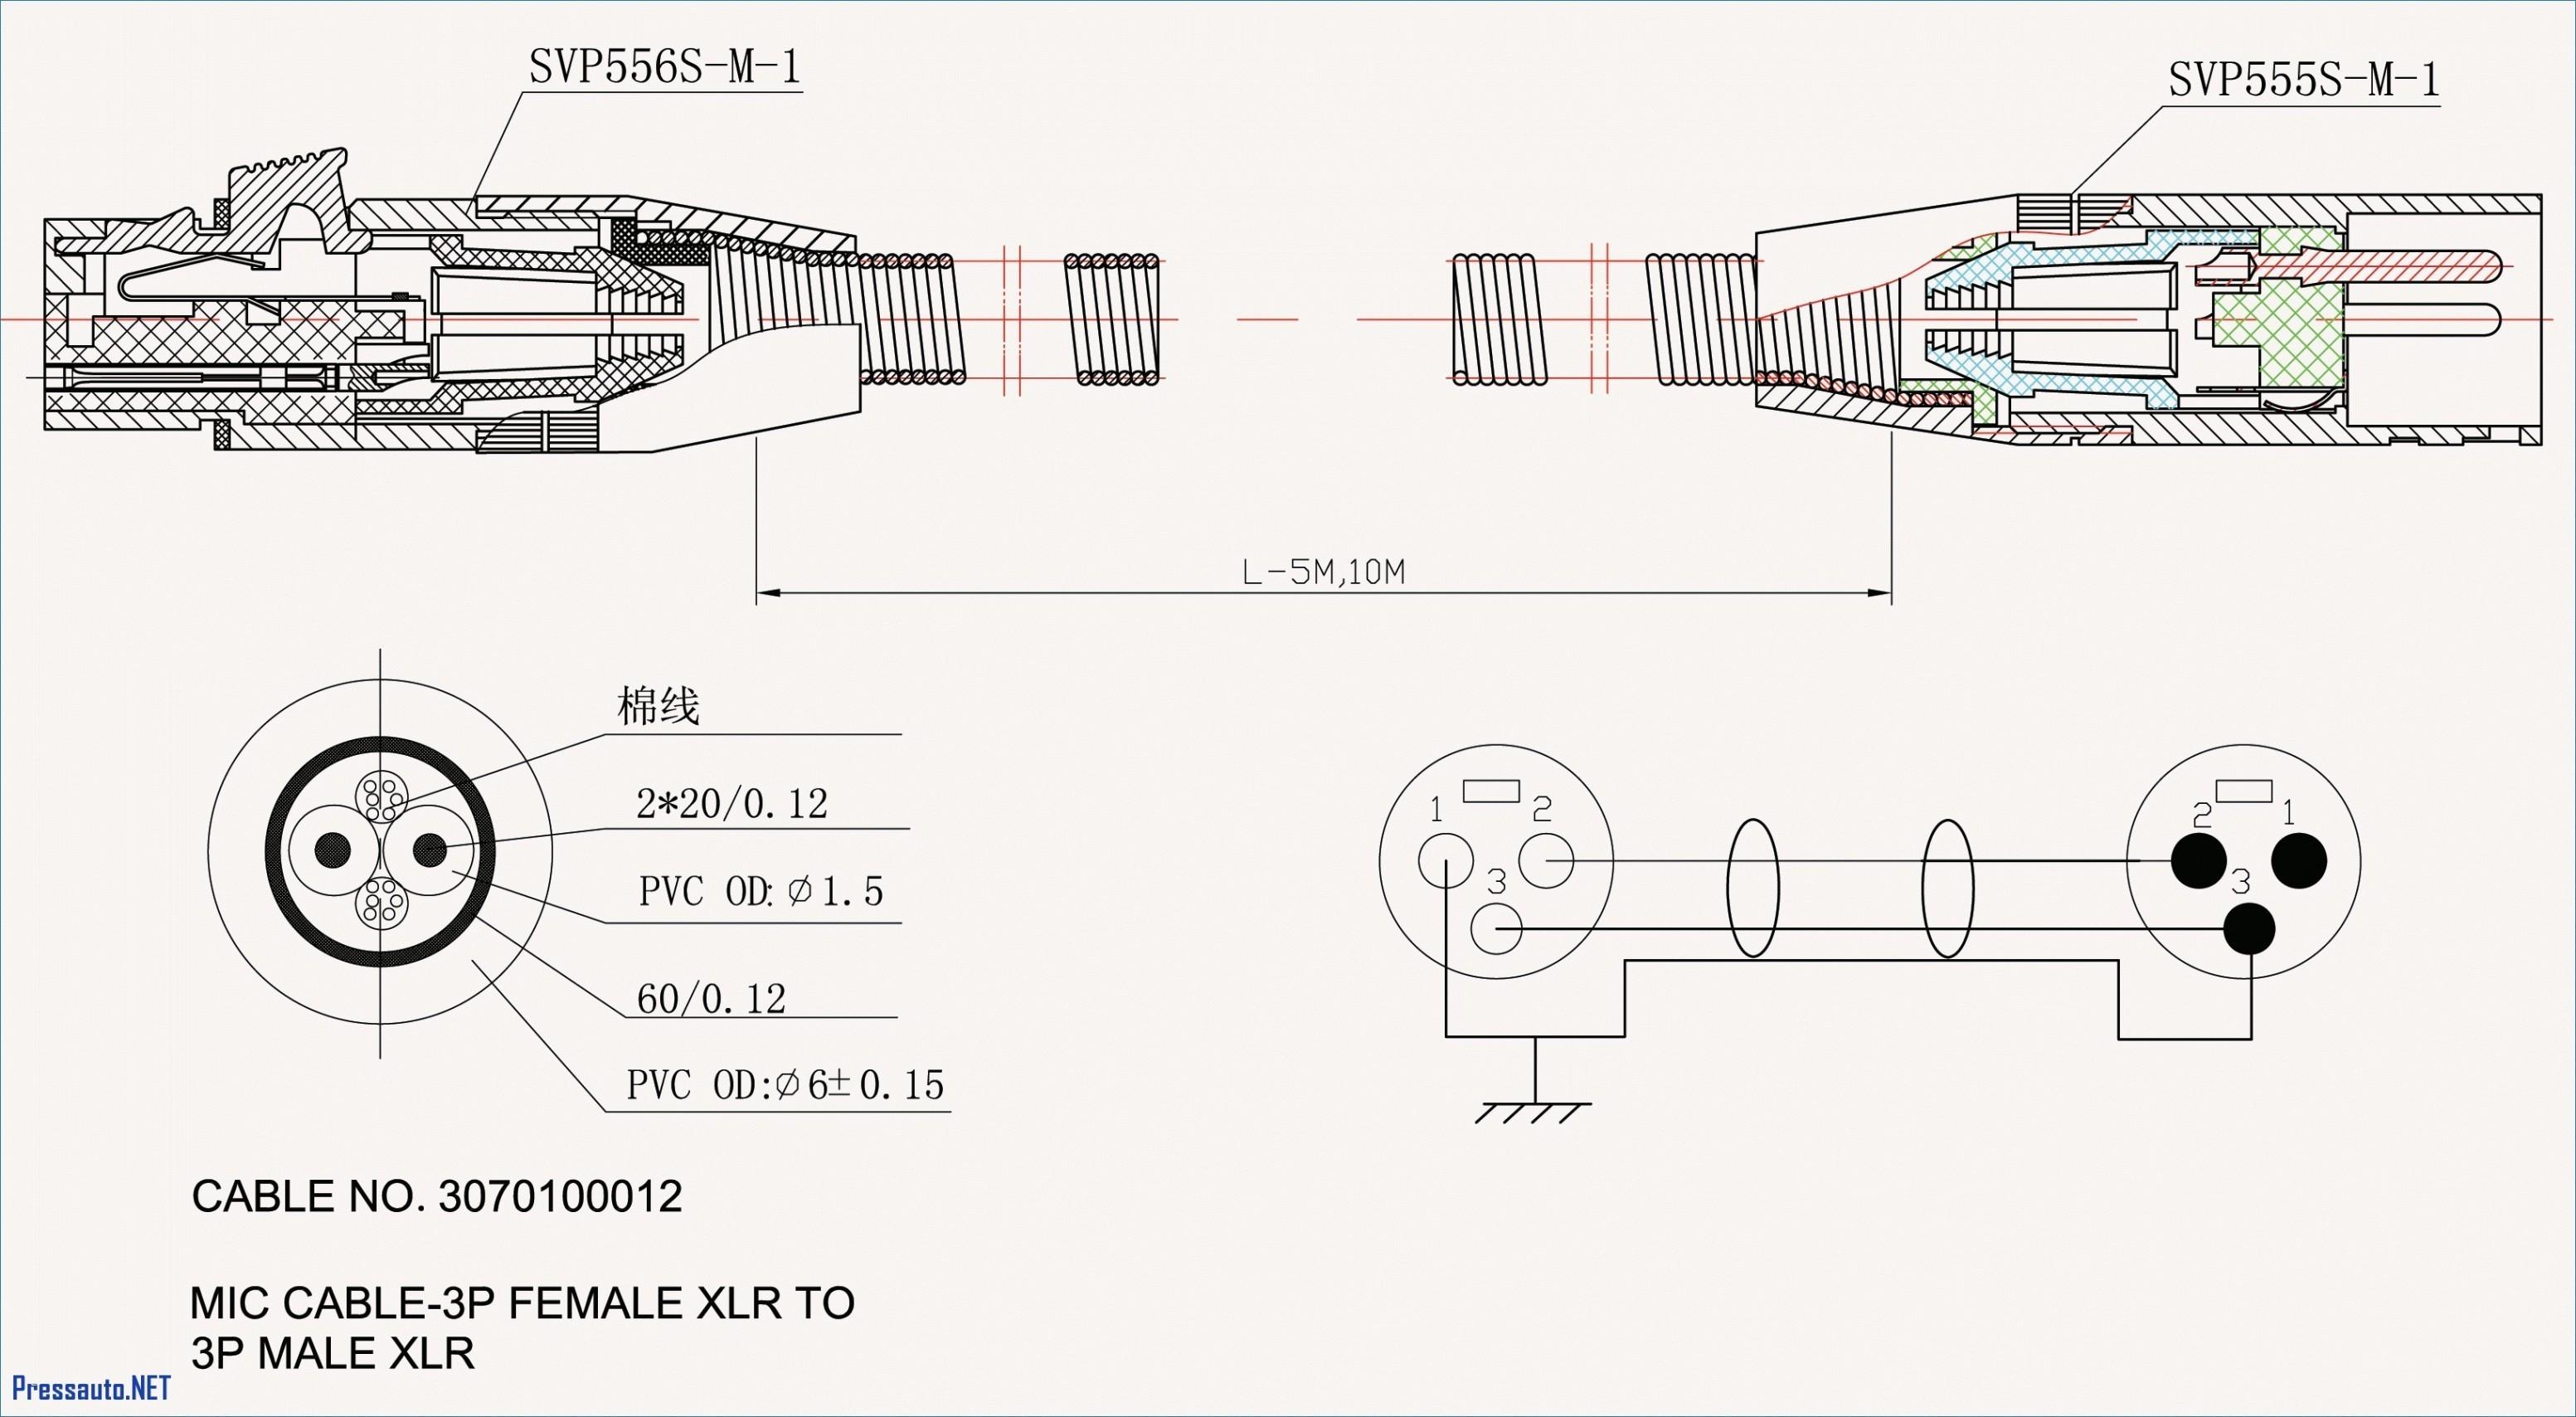 L14 30p Wiring Diagram Wiring Diagram Avanza Manual Save L14 30 Wiring Diagram Elgrifo Of L14 30p Wiring Diagram Nema Wiring Diagram Wire Data Schema •